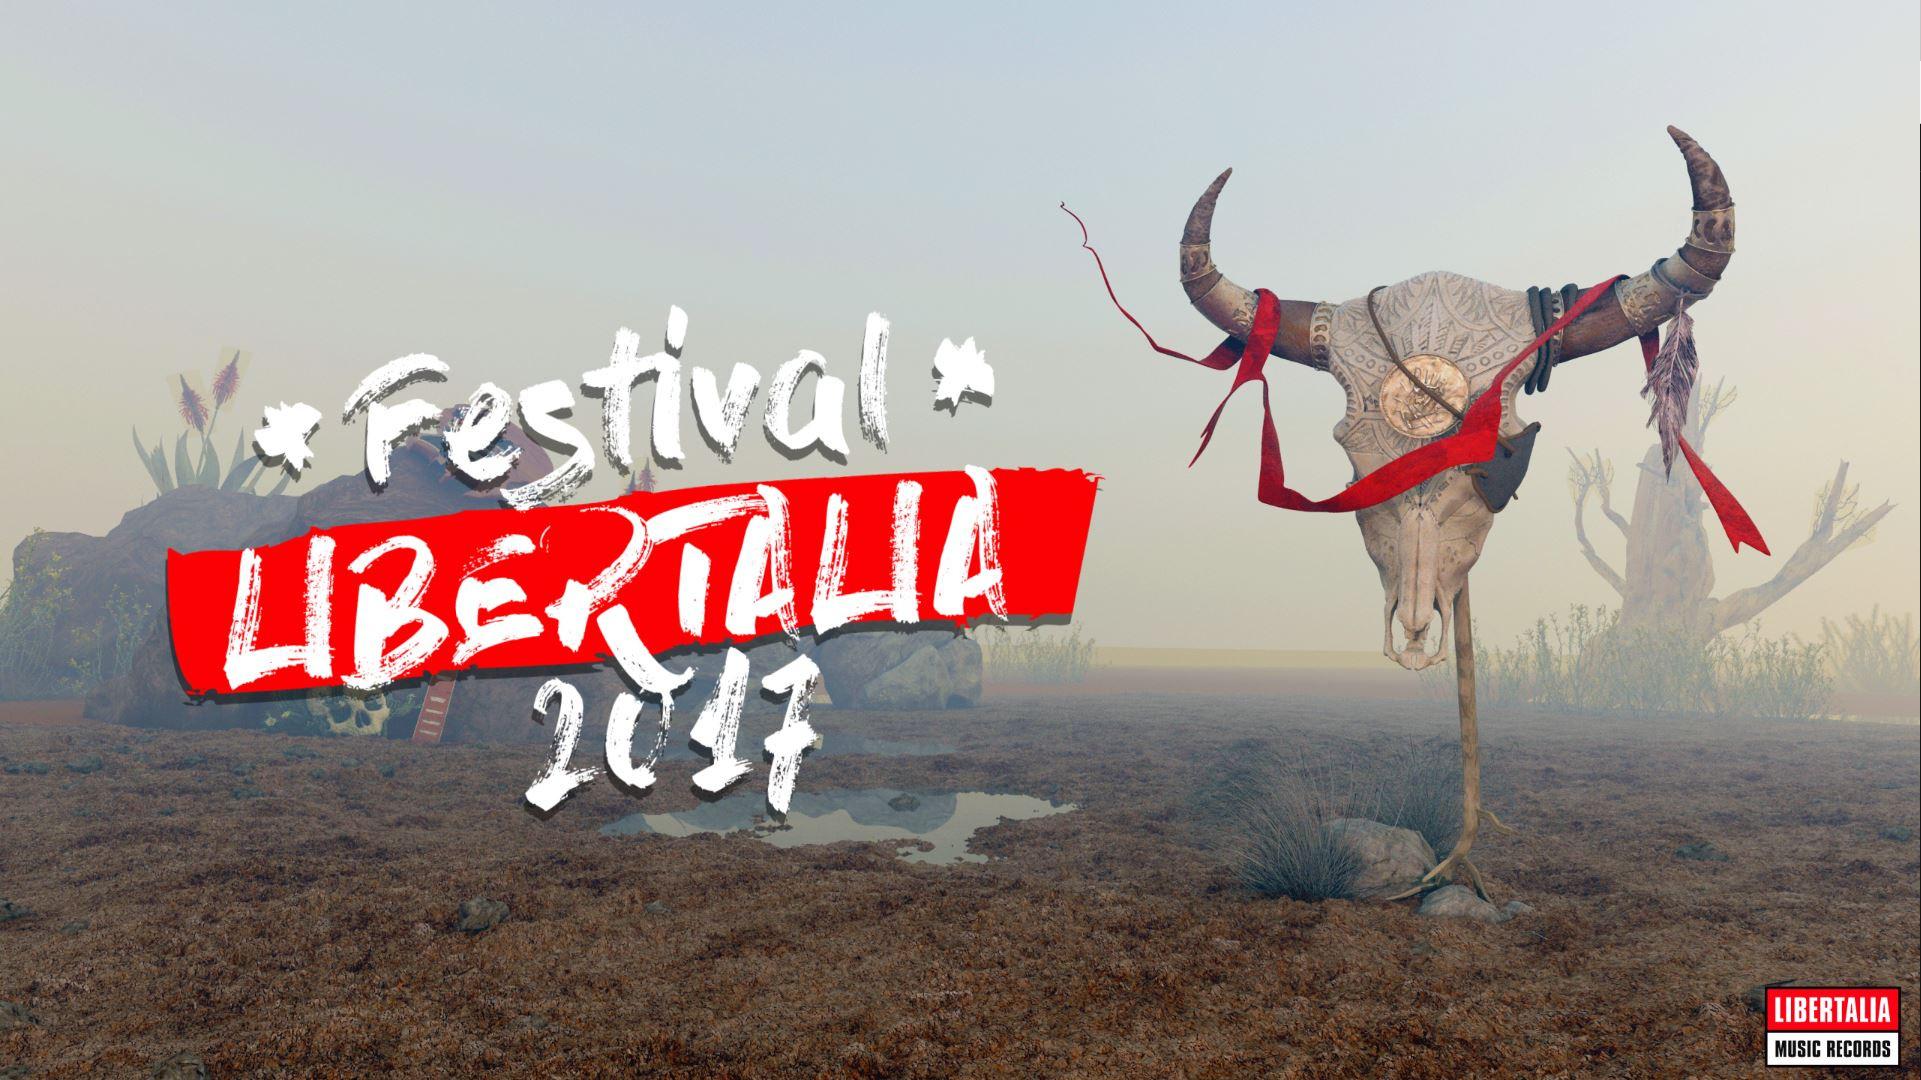 Final product for Libertalia Festival 2017 #MG  2D Art by Weedi